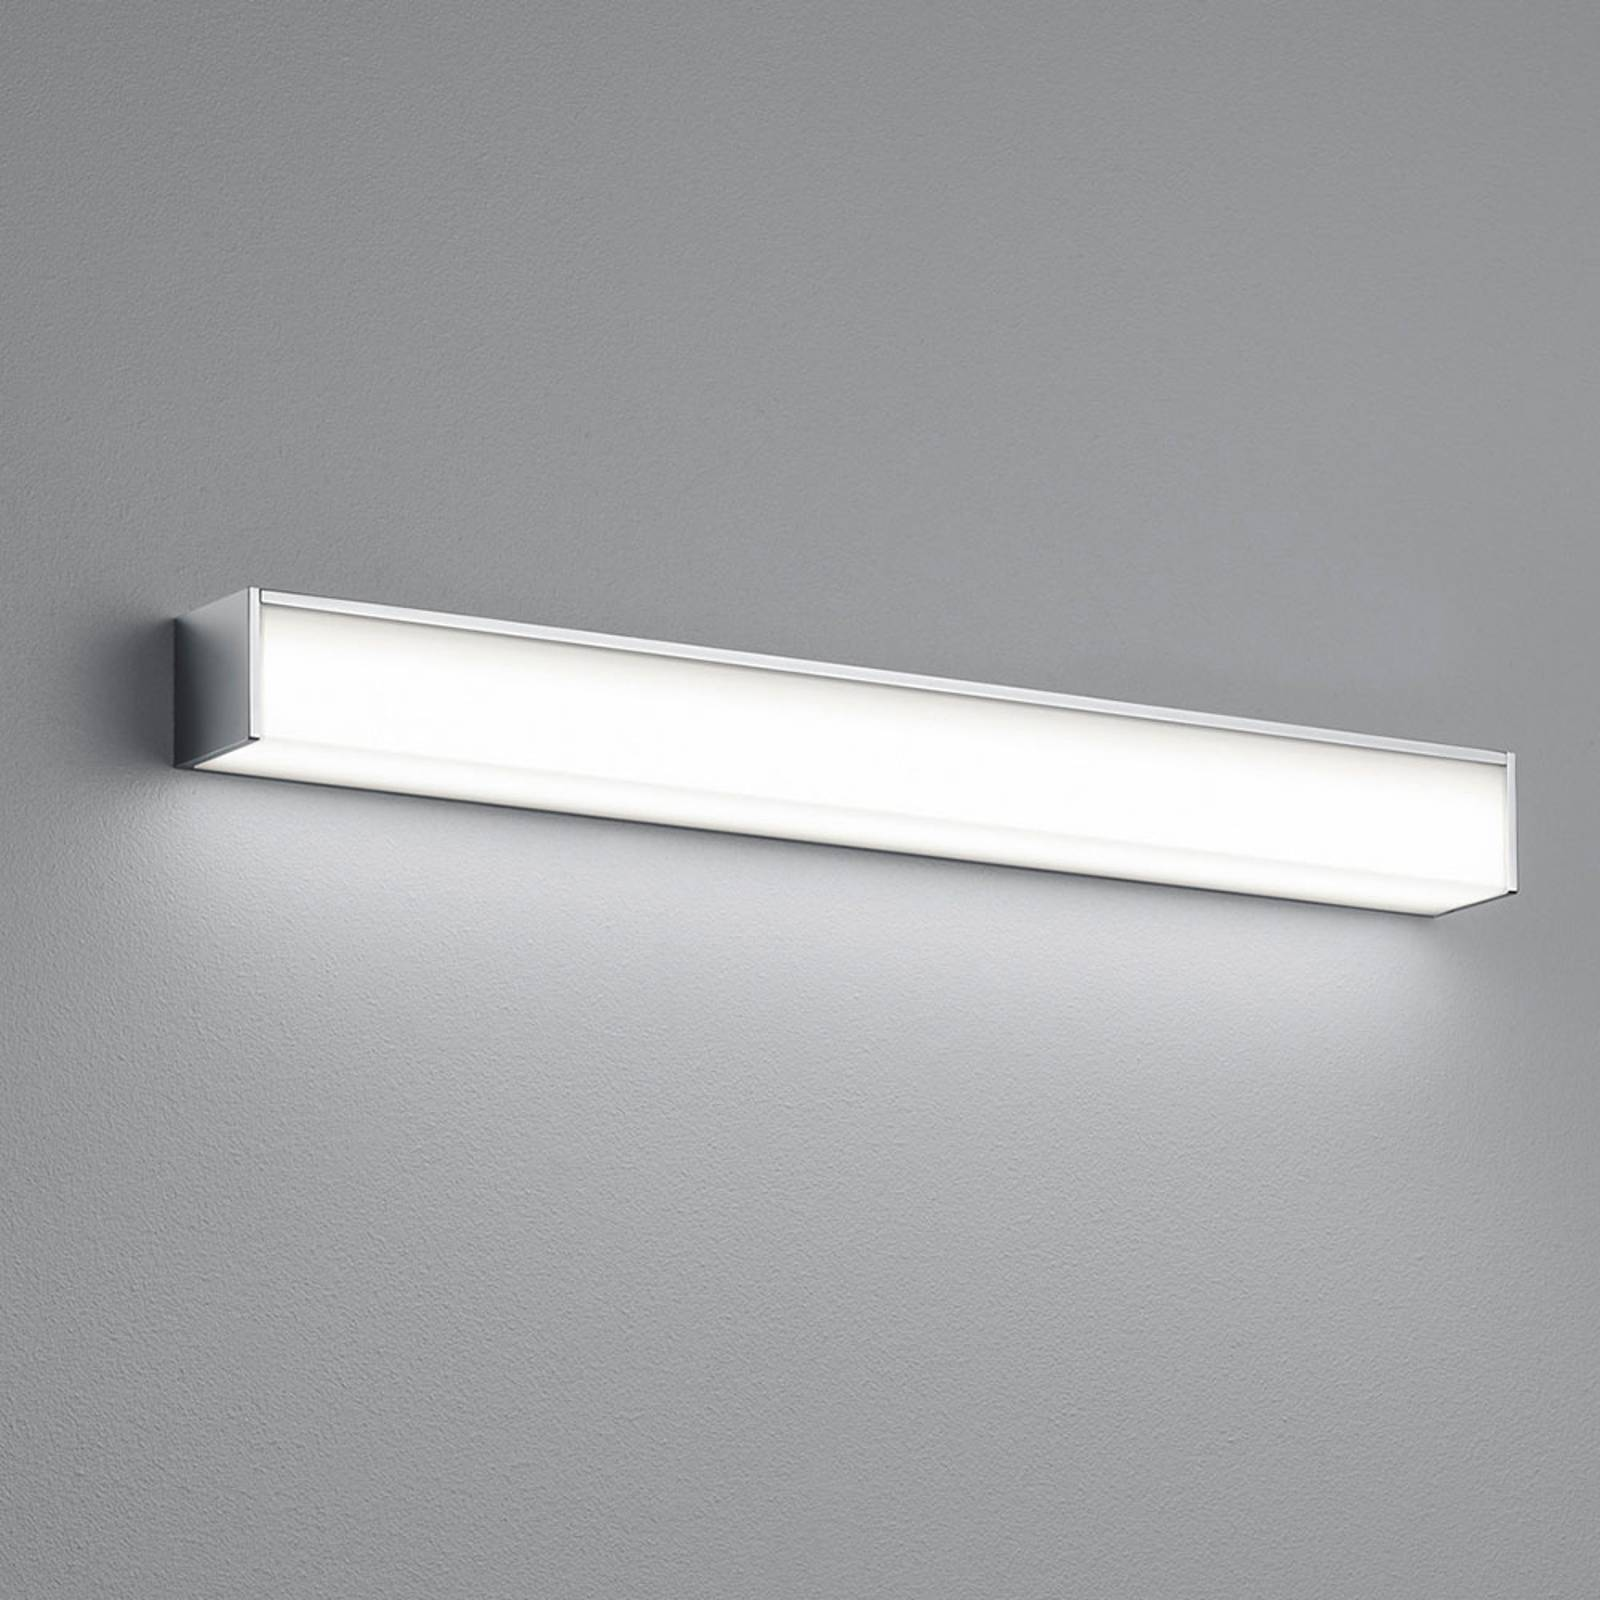 Helestra Nok applique pour miroir LED 60cm